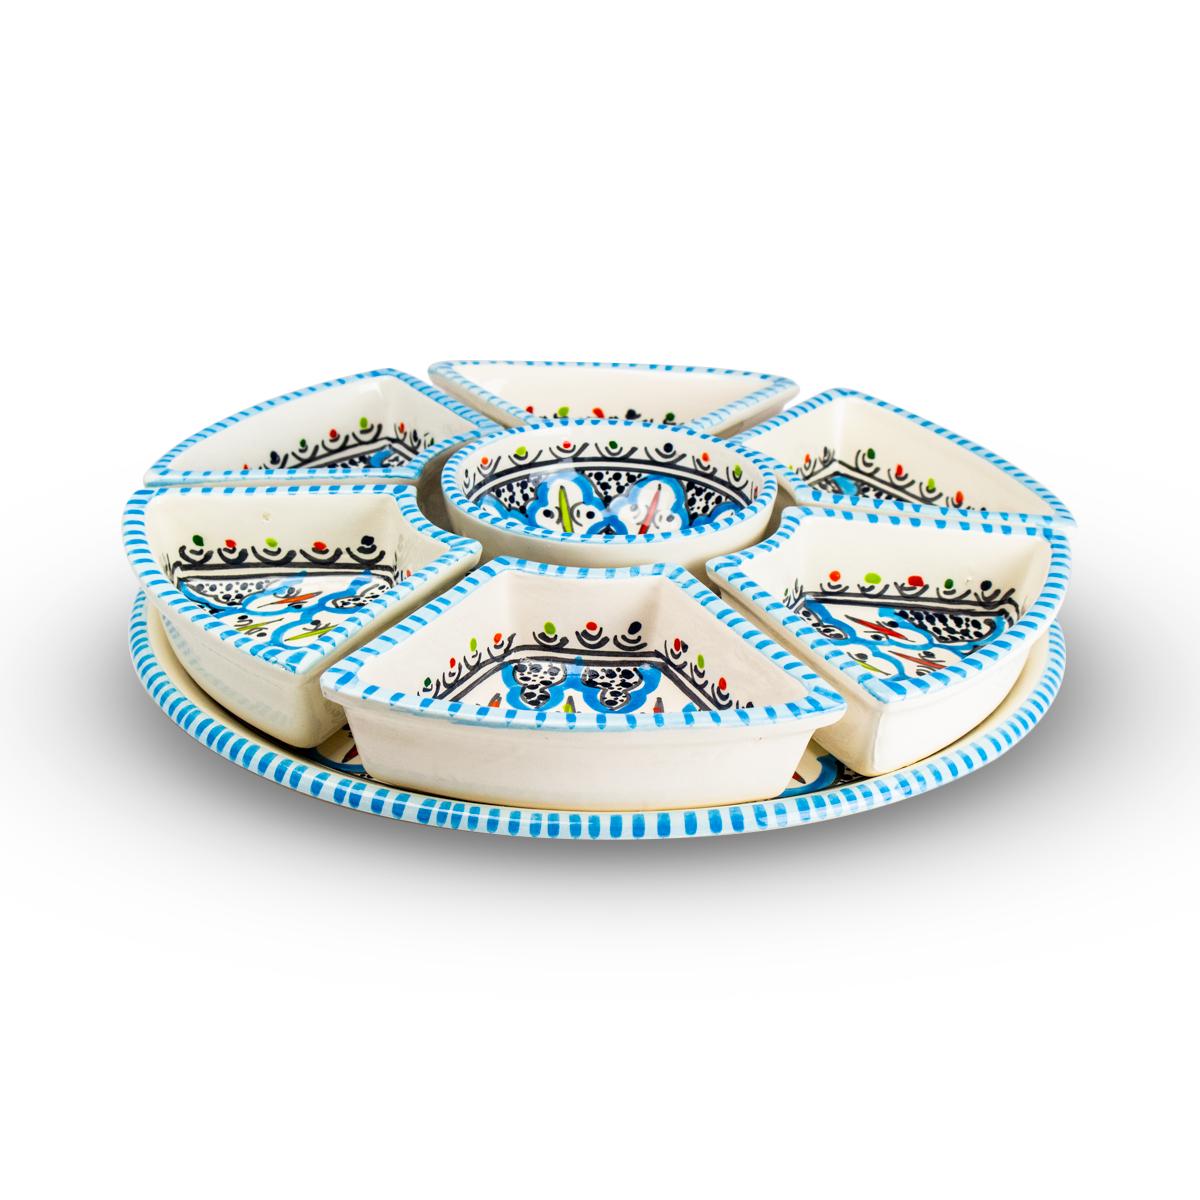 Dishes & Deco Snack & Tapasschale Turquoise Blue Fine 8-teilig